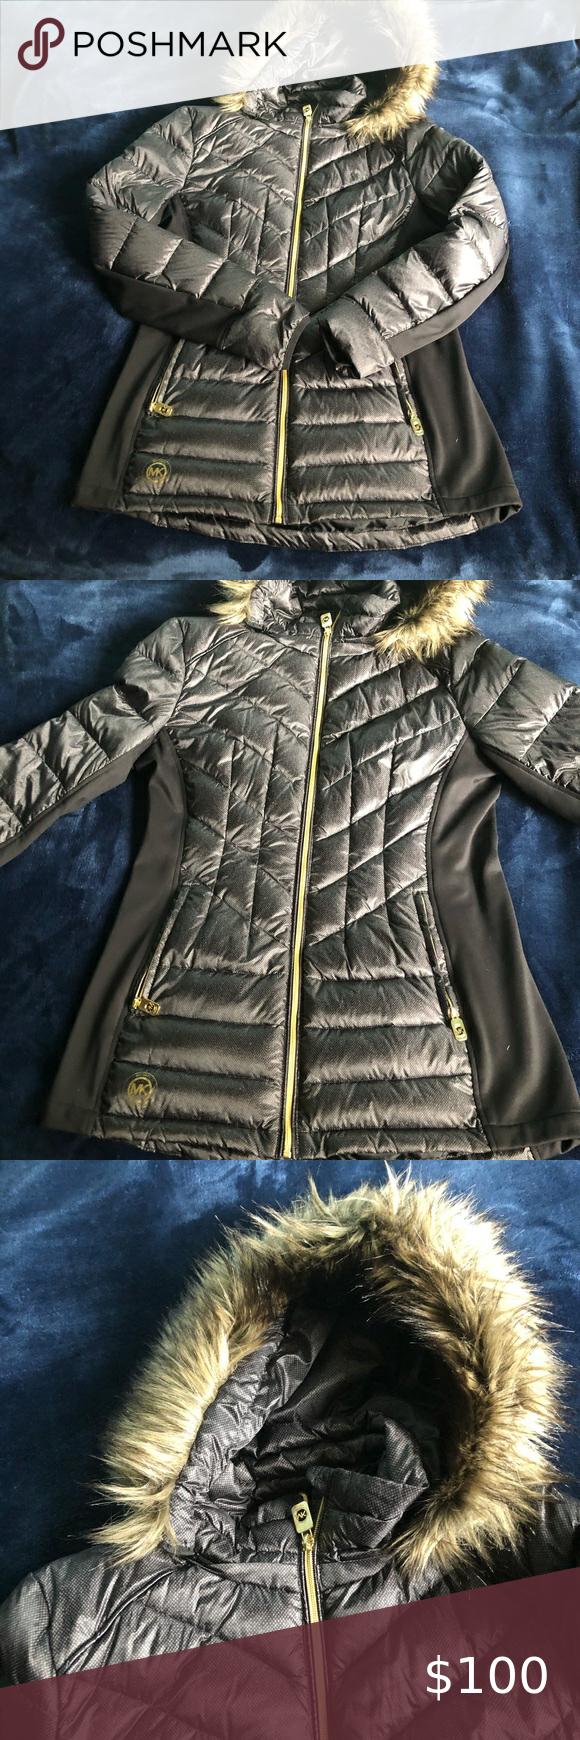 Nwot Michael Kors Puffer Jacket With Faux Fur Michael Kors Michael Kors Jackets Puffer Jackets [ 1740 x 580 Pixel ]